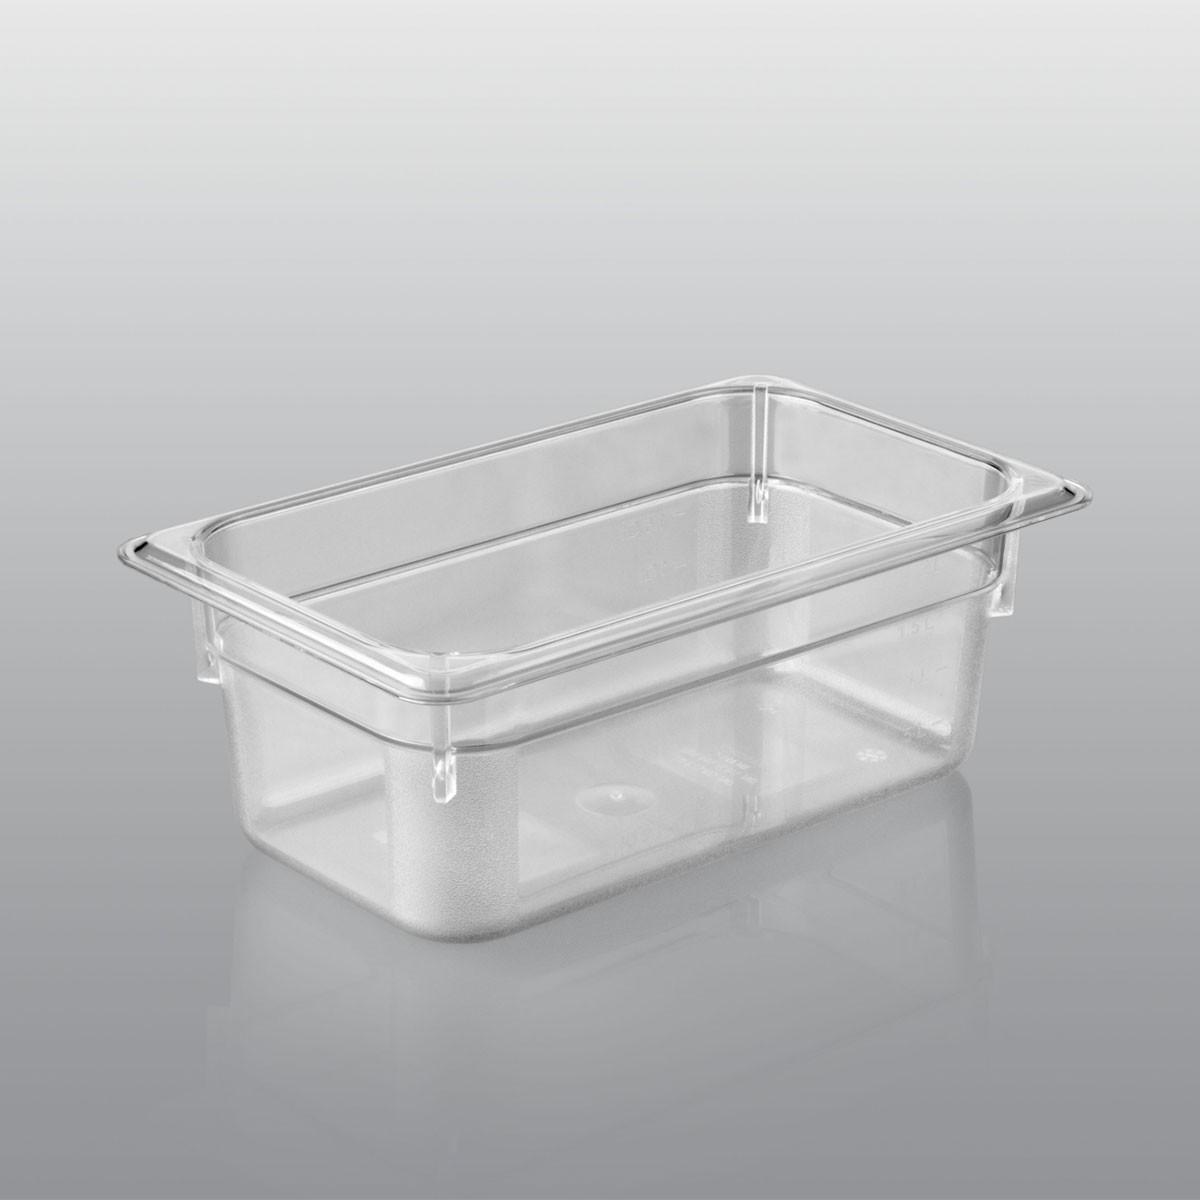 GN-Behälter GN 1/4 aus Polycarbonat (Tiefe: 100mm) 2,8 L Saro